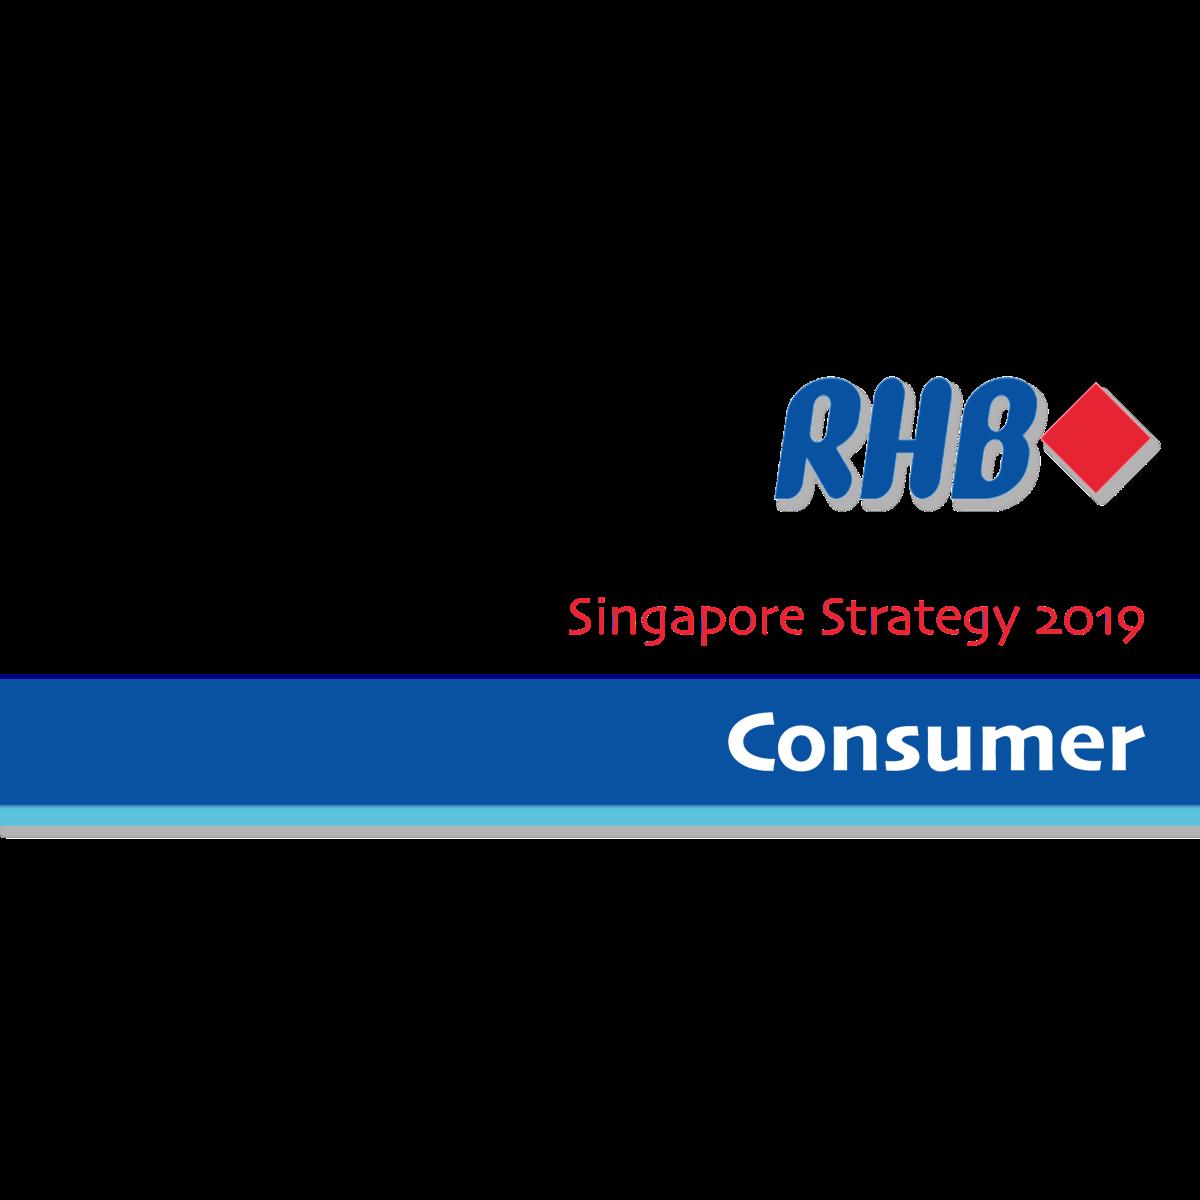 Singapore Strategy 2019 ~ Consumer Sector - RHB Research | SGinvestors.io